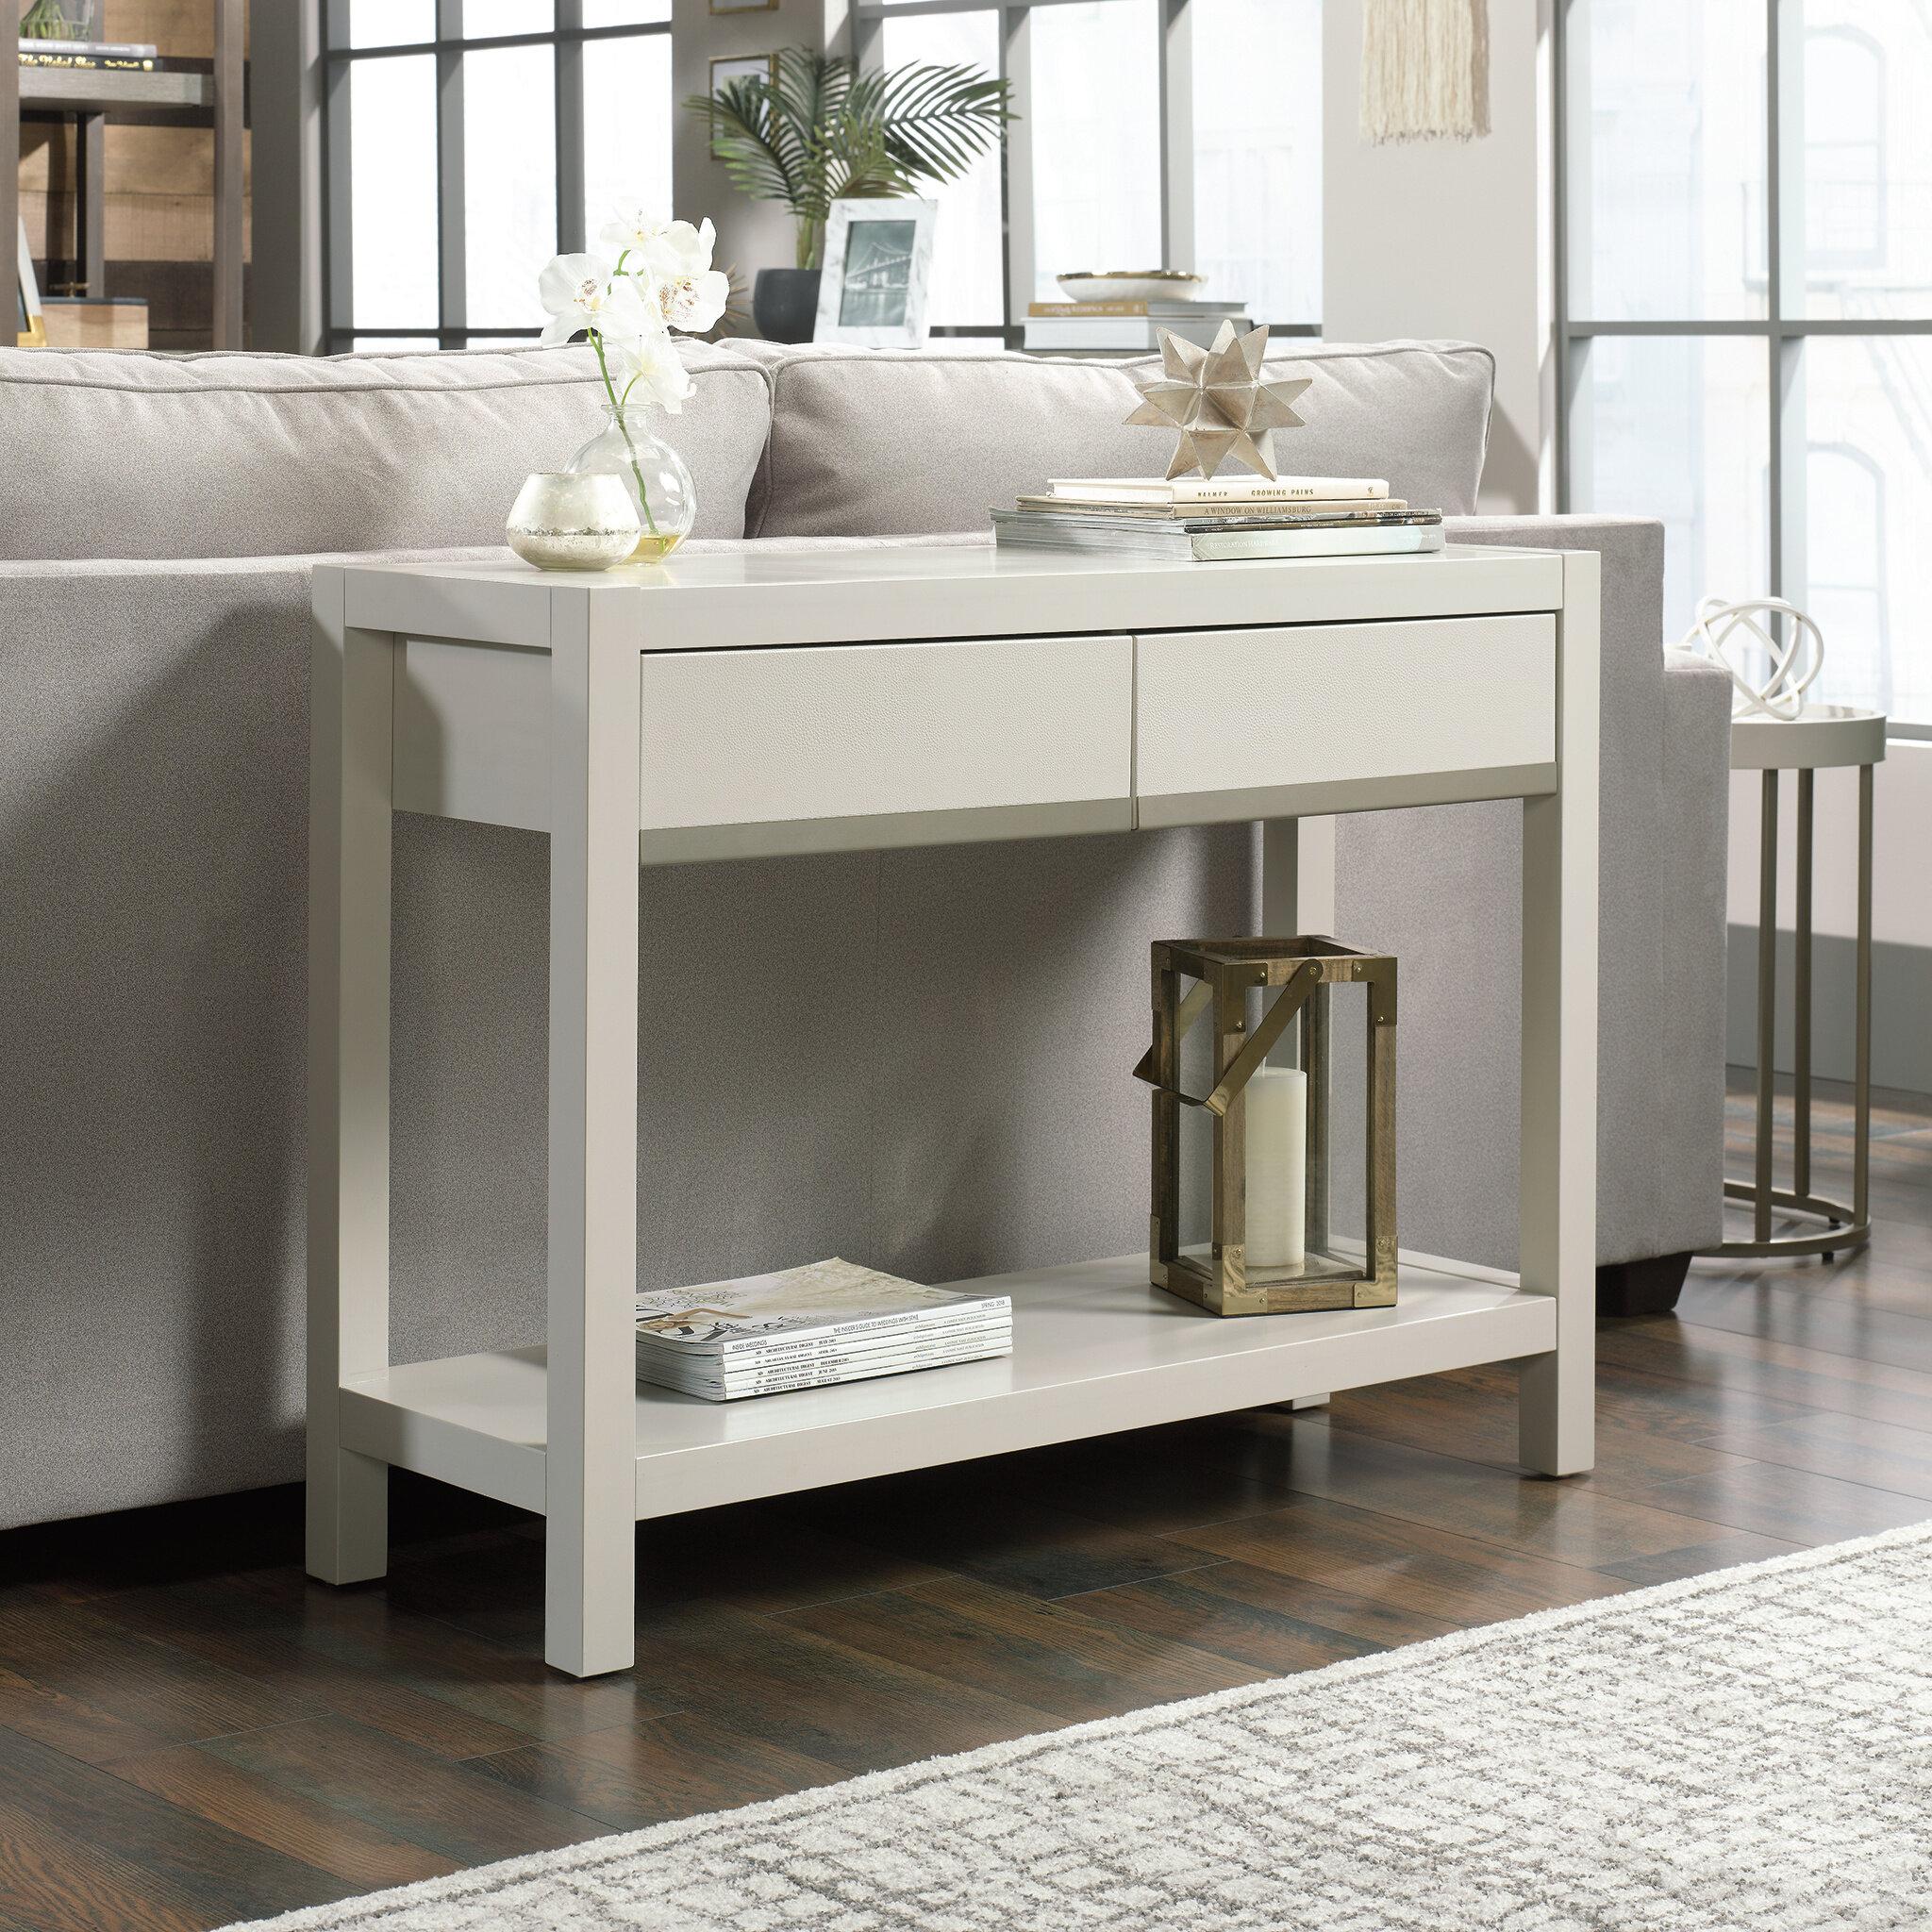 Ebern Designs Wolfforth 40 Solid Wood Console Table Wayfair